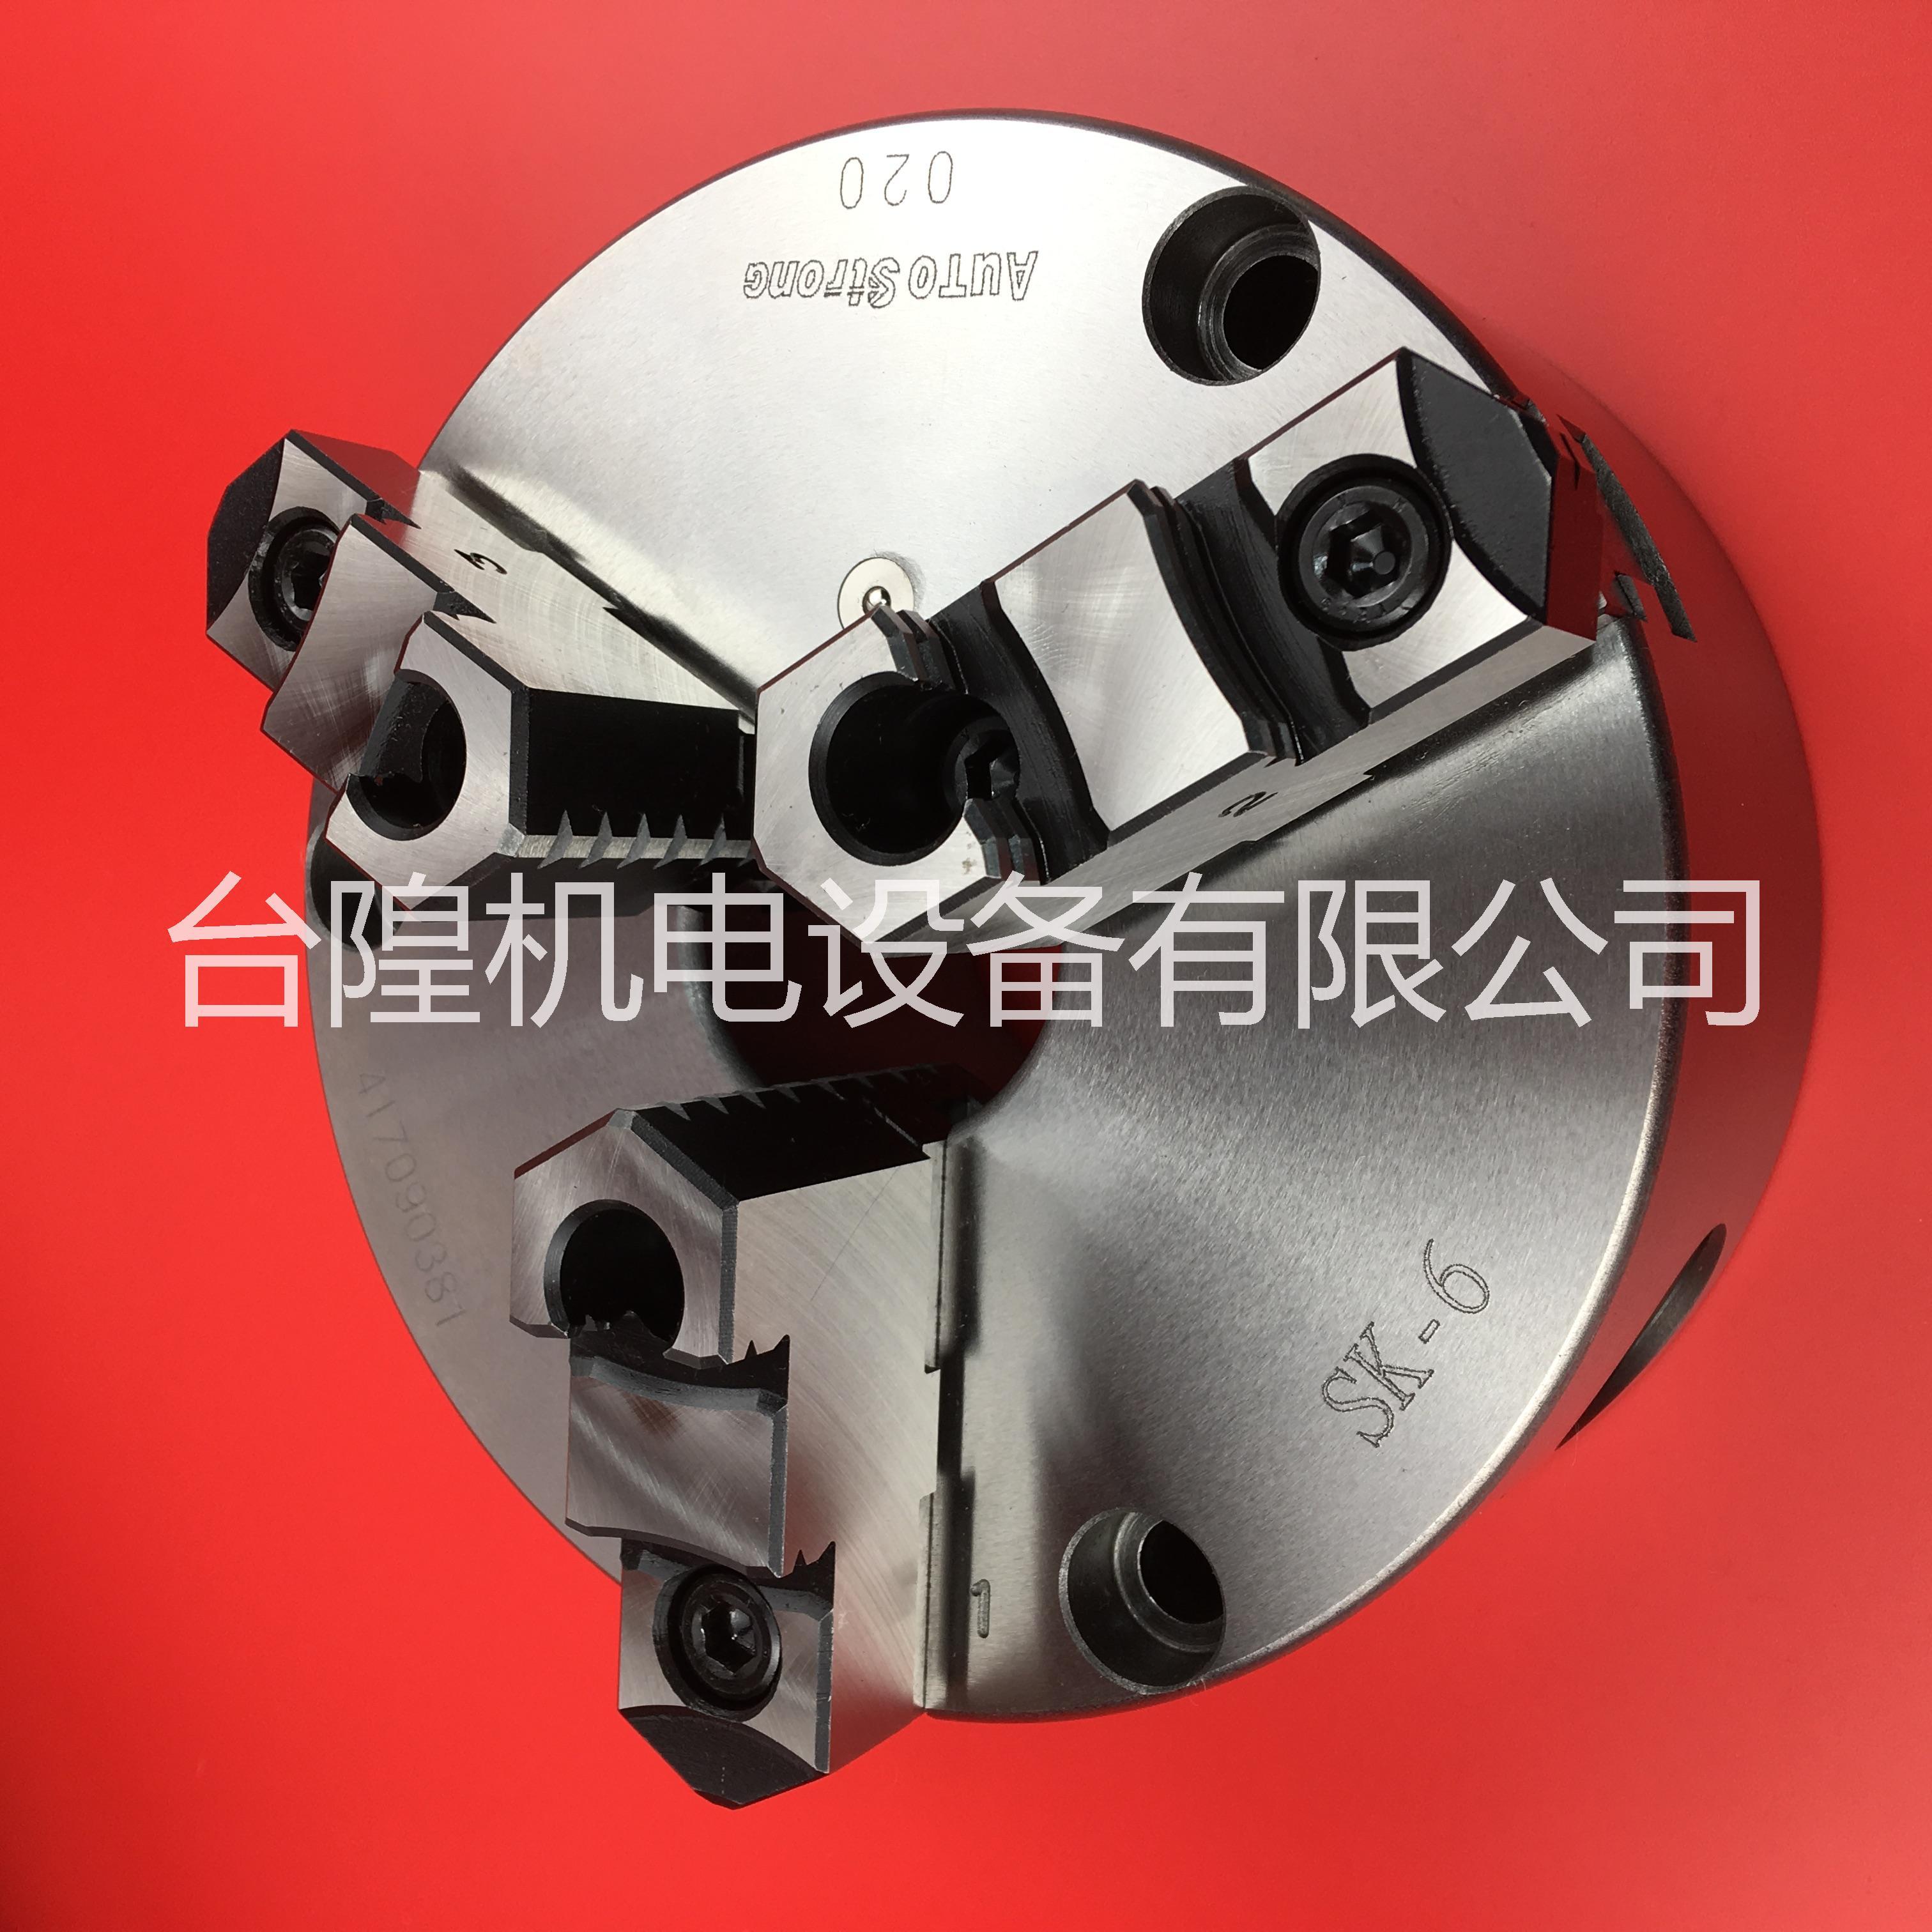 SK-5/6/7/8/9/10亿川手动卡盘三爪强力型台湾原厂直销